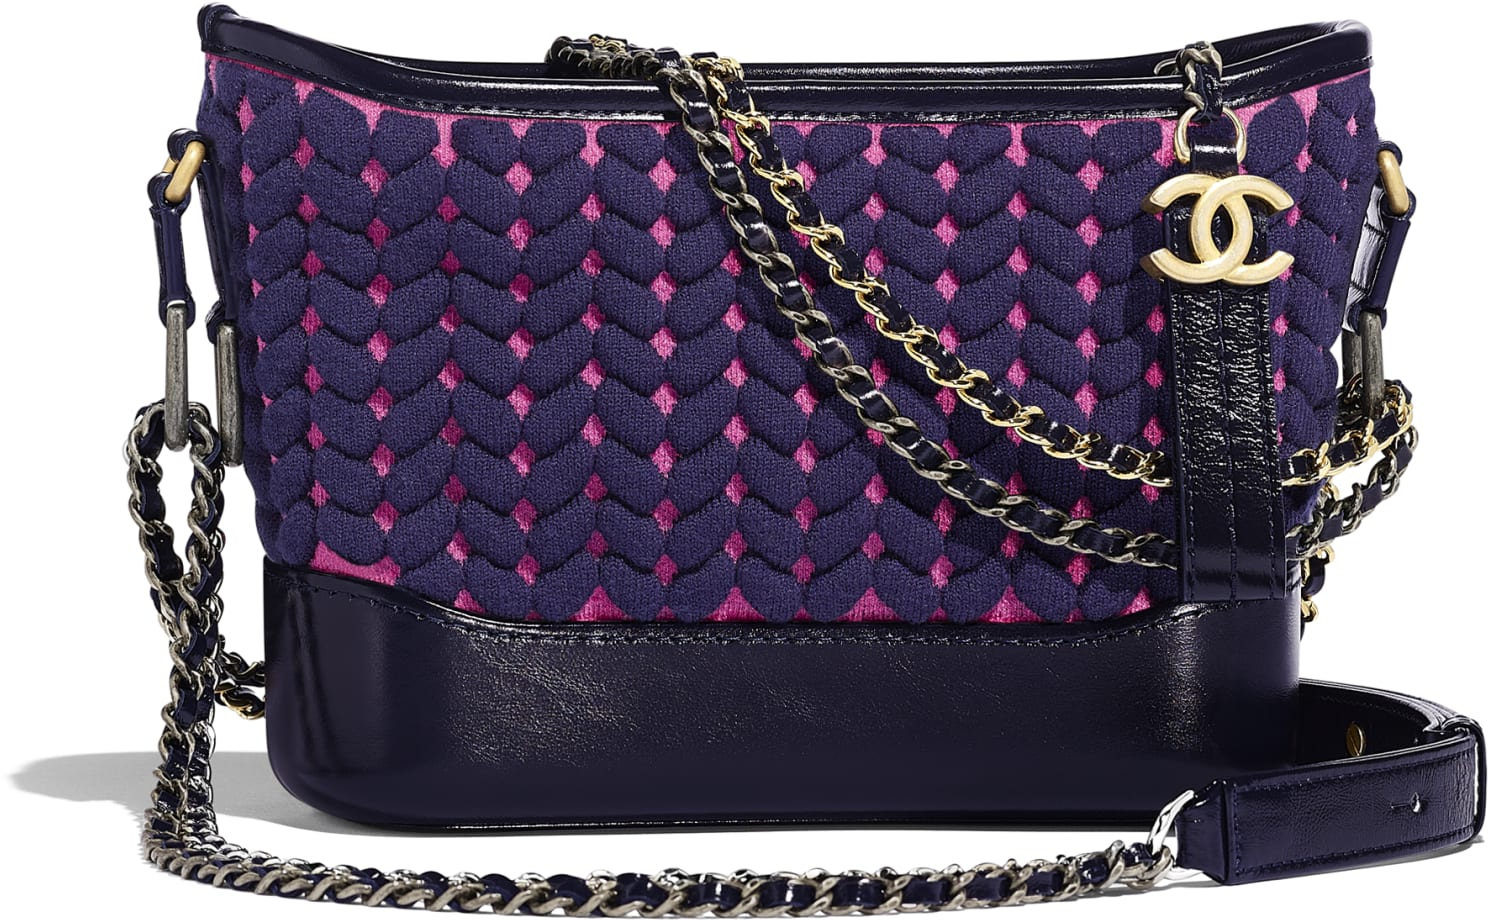 Borsa a spalla Gabrielle de Chanel in lana intrecciata